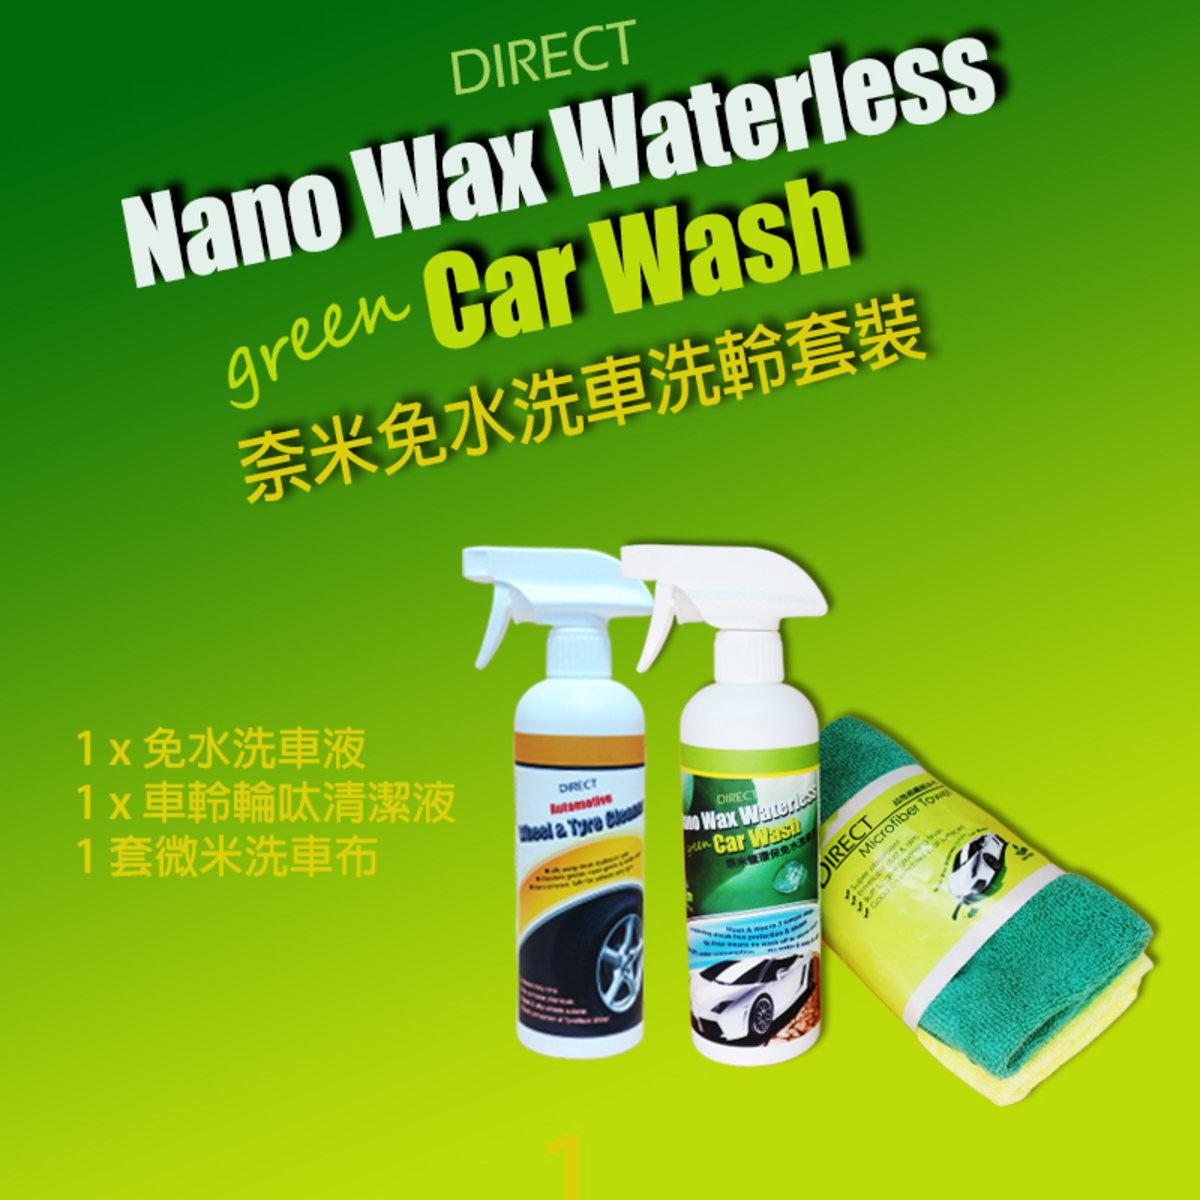 Nano Wax Waterless Carwash & Wheel Cleaner Package